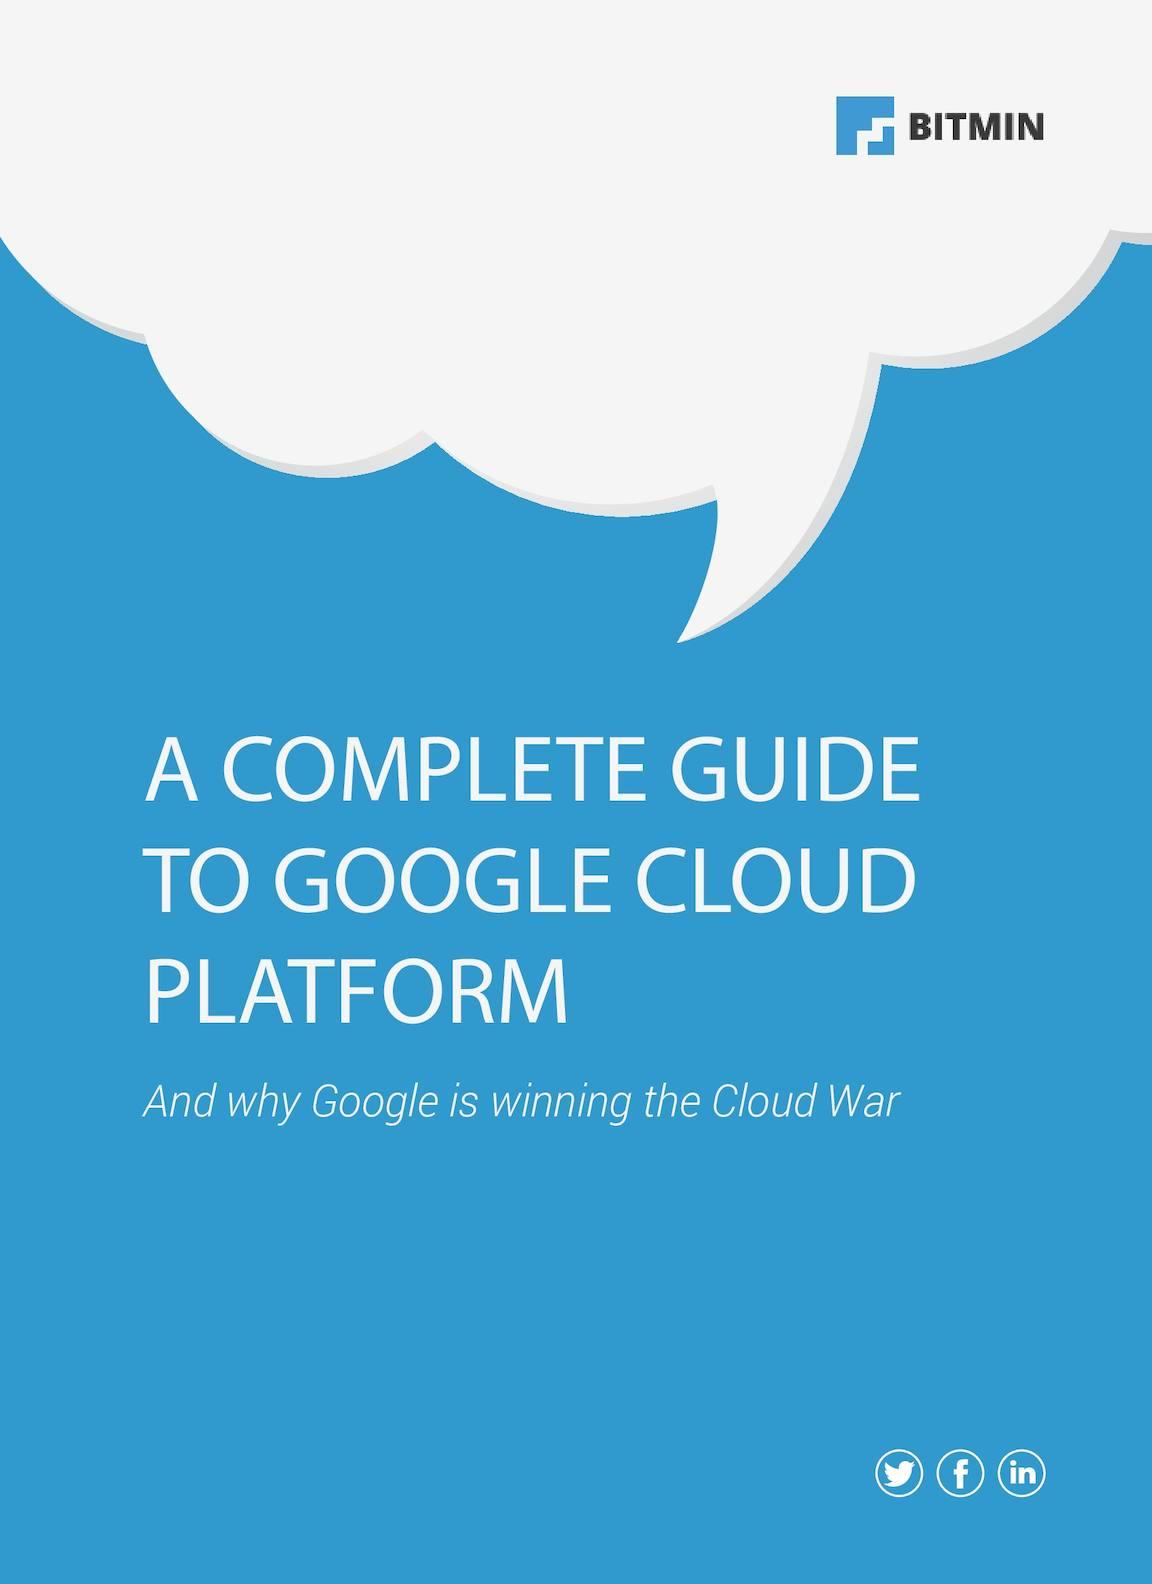 Calaméo - A Complete Guide to the Google Cloud Platform